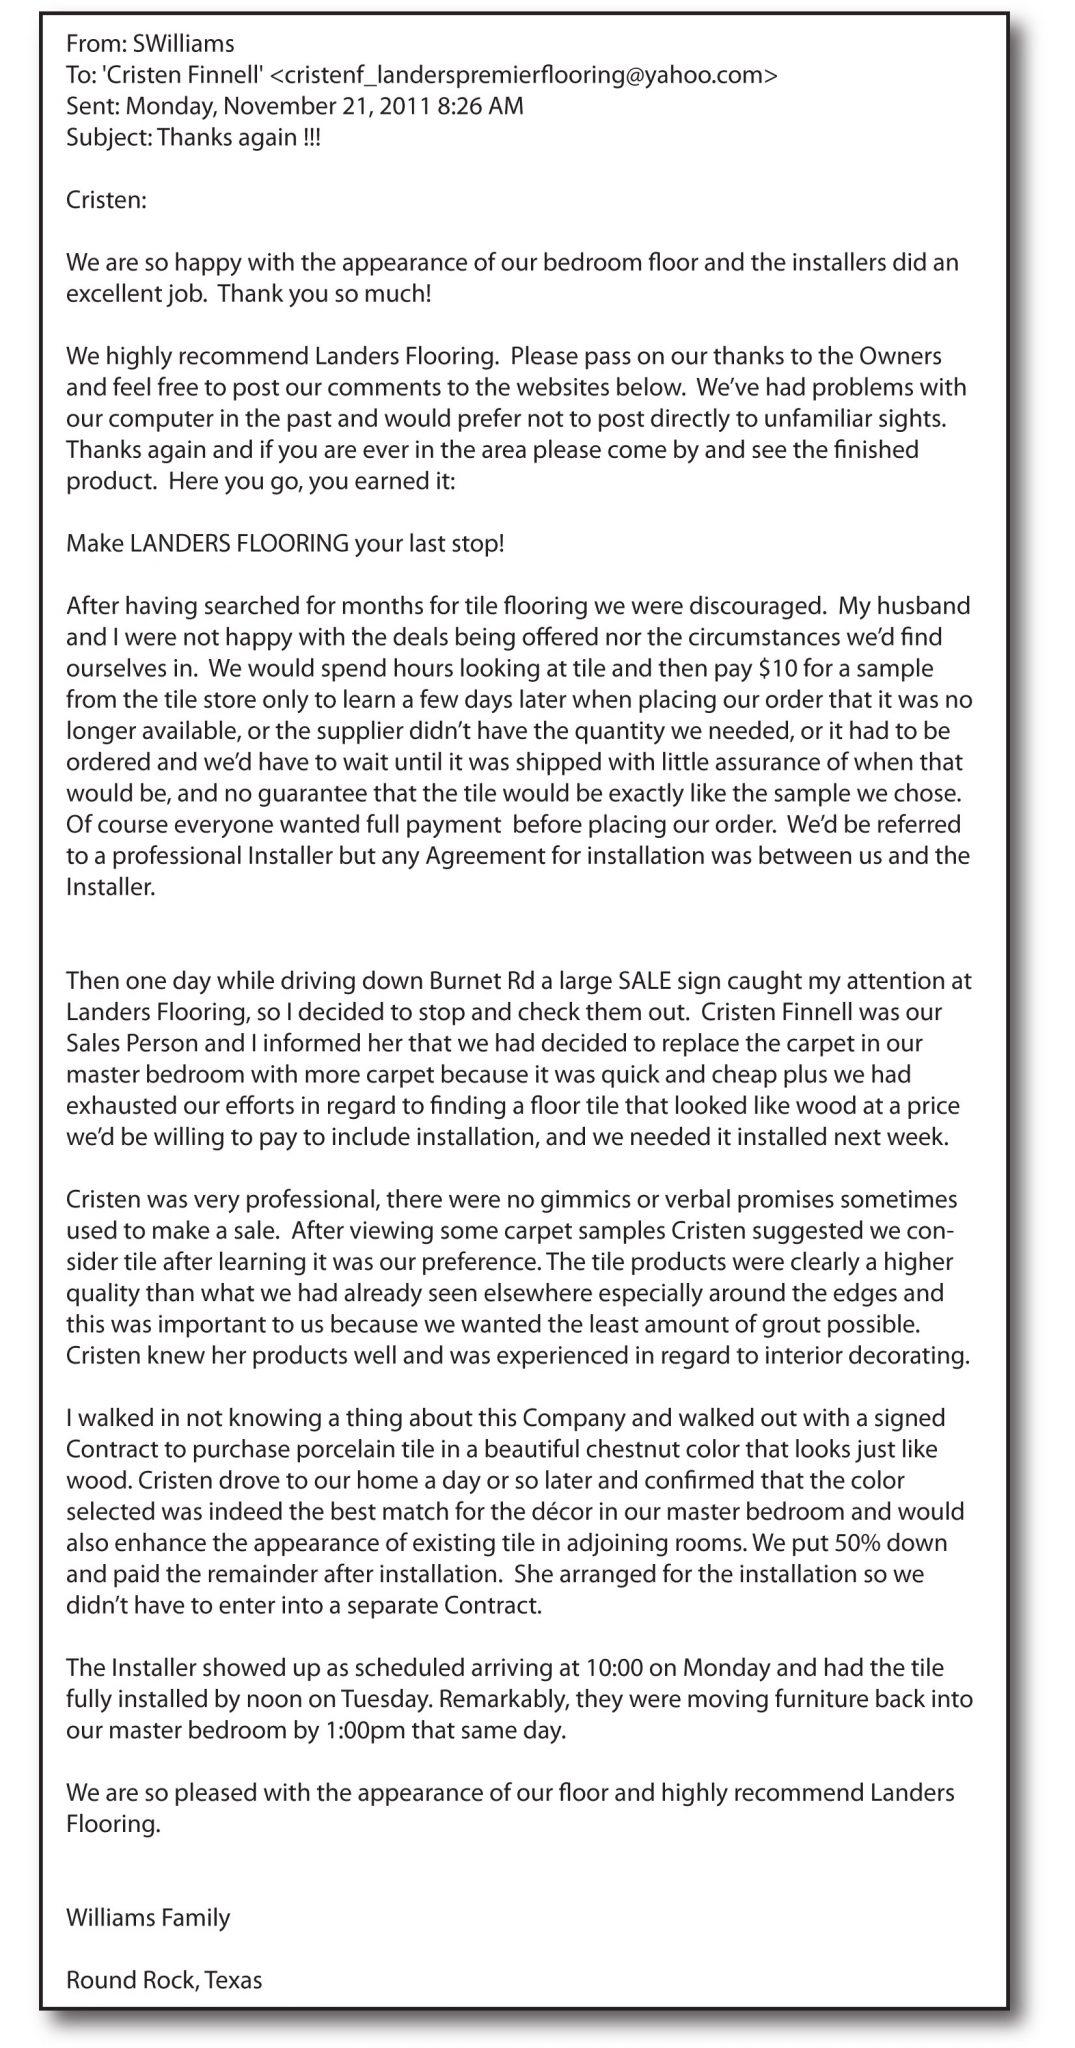 Letters of Recommendation | Landers Premier Flooring